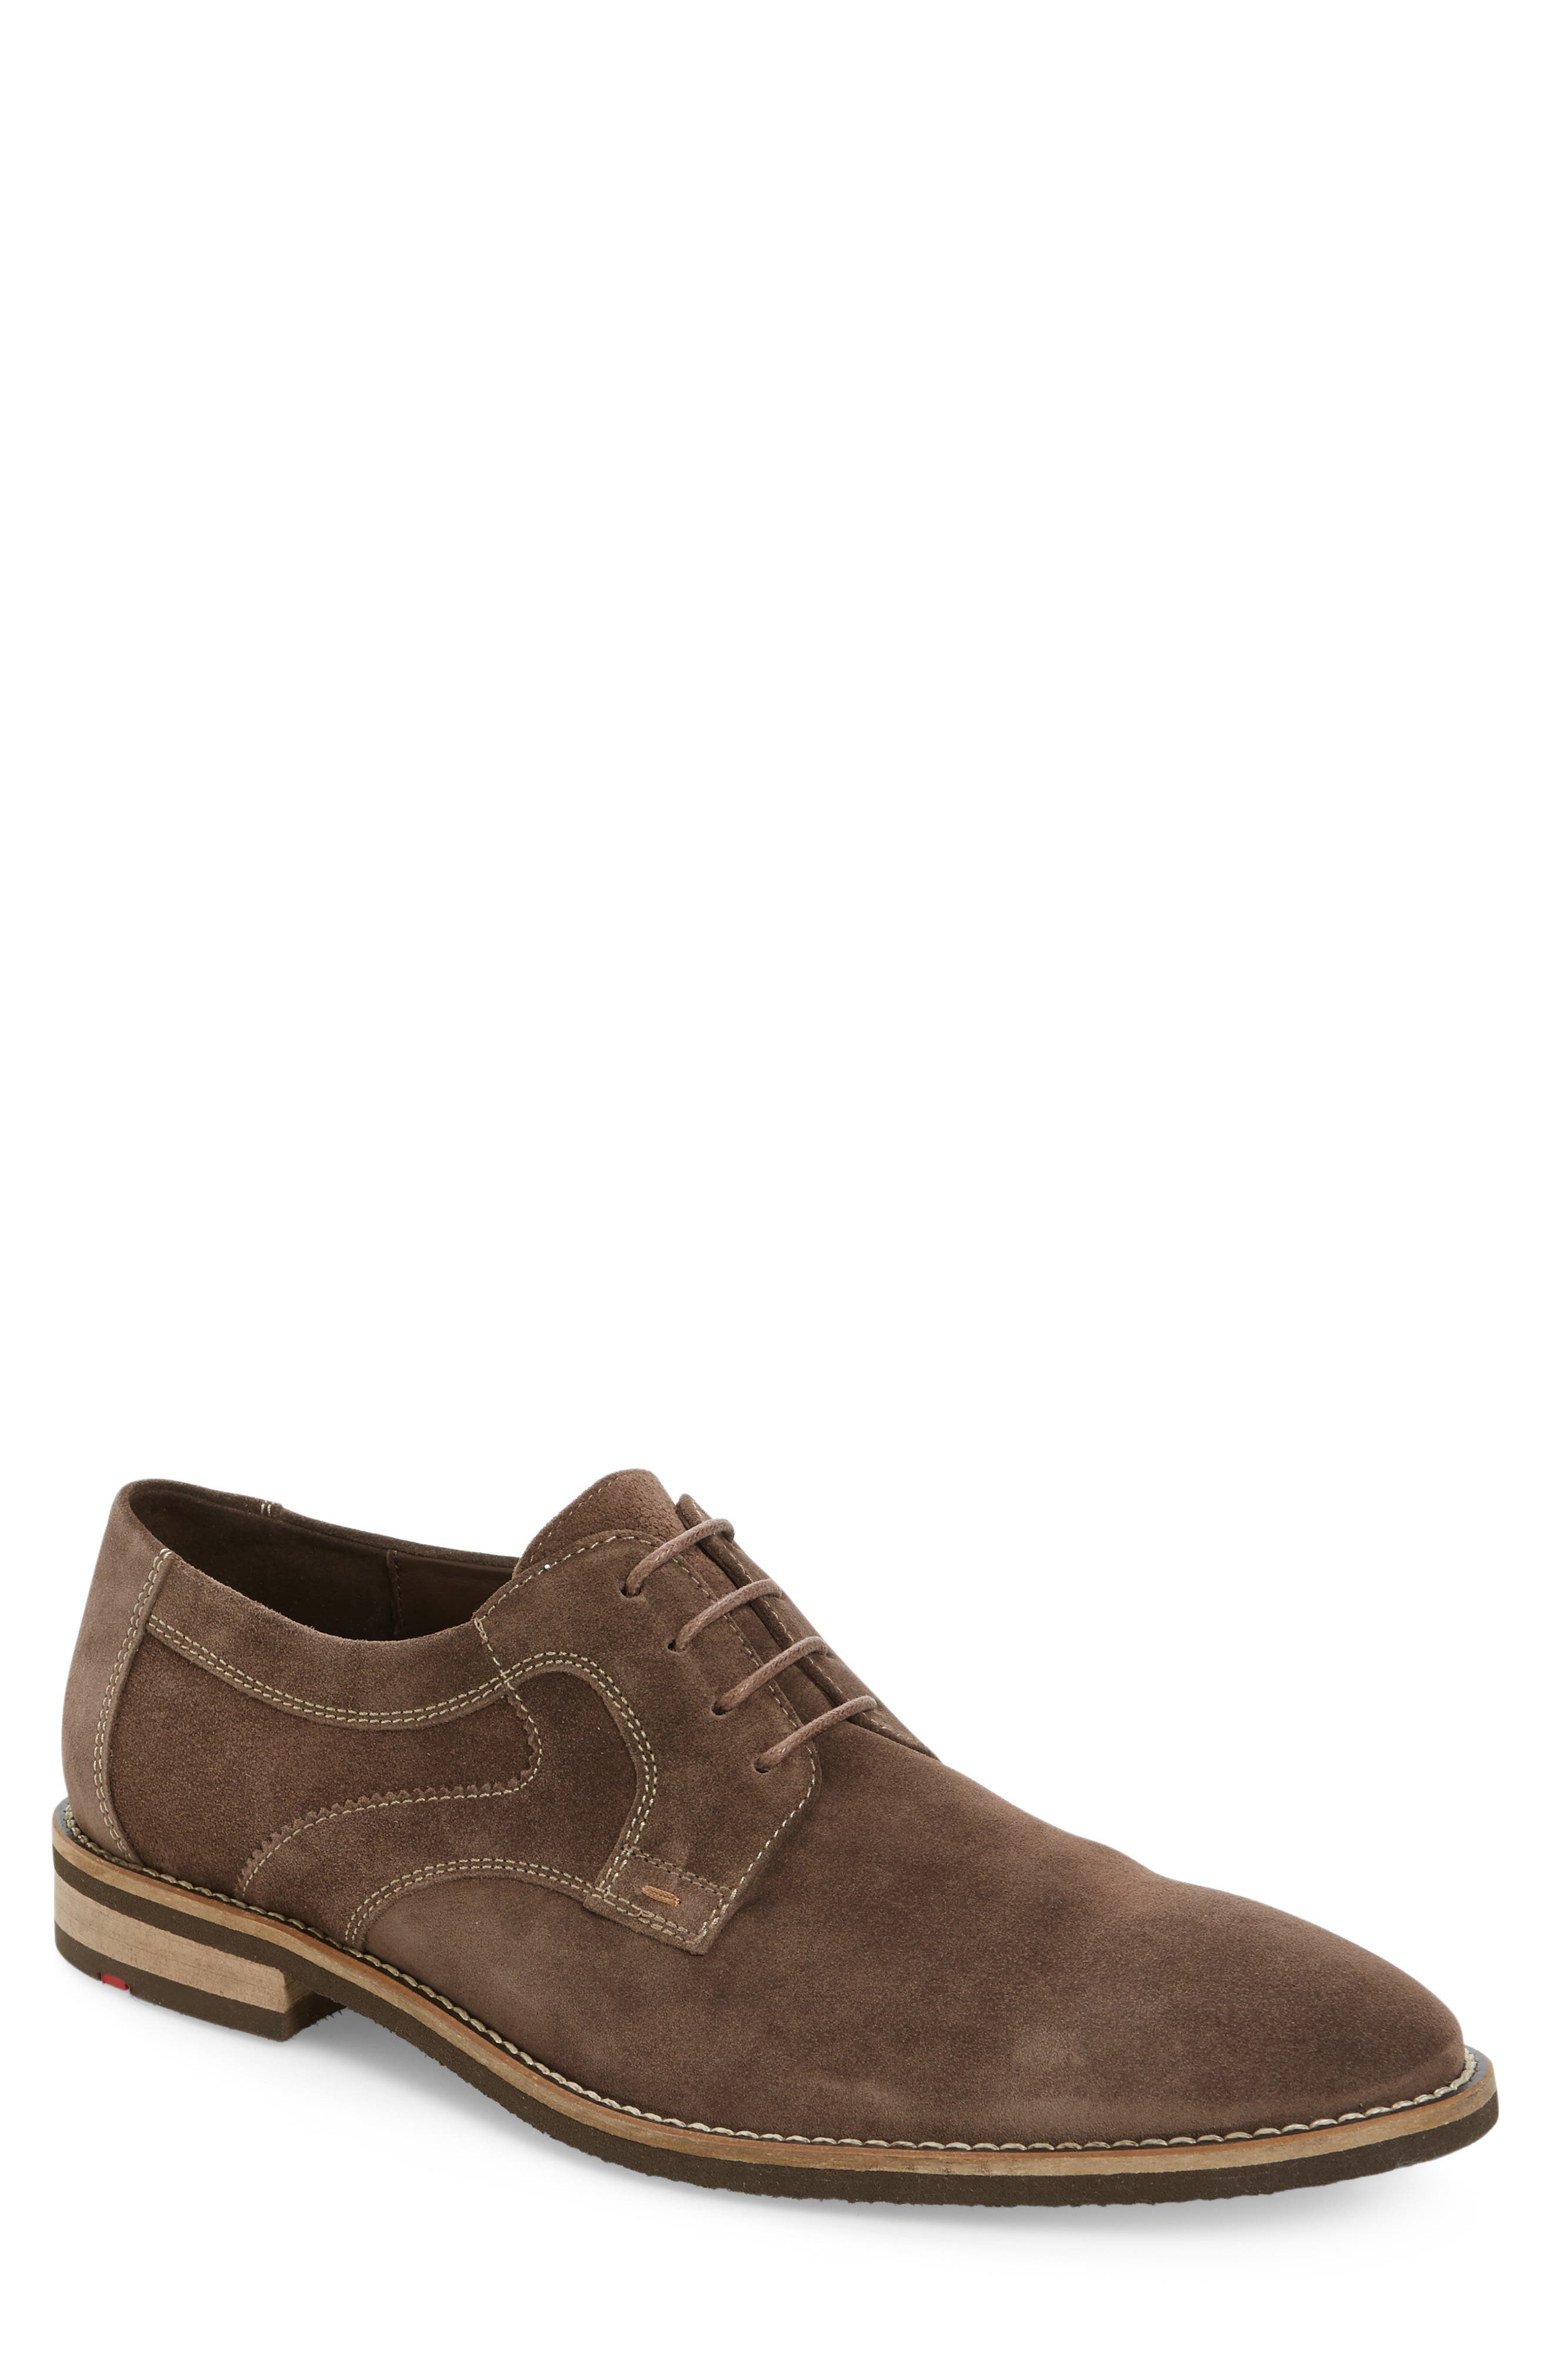 Haarlem Buck Shoe,                             Main thumbnail 1, color,                             Noce Brown